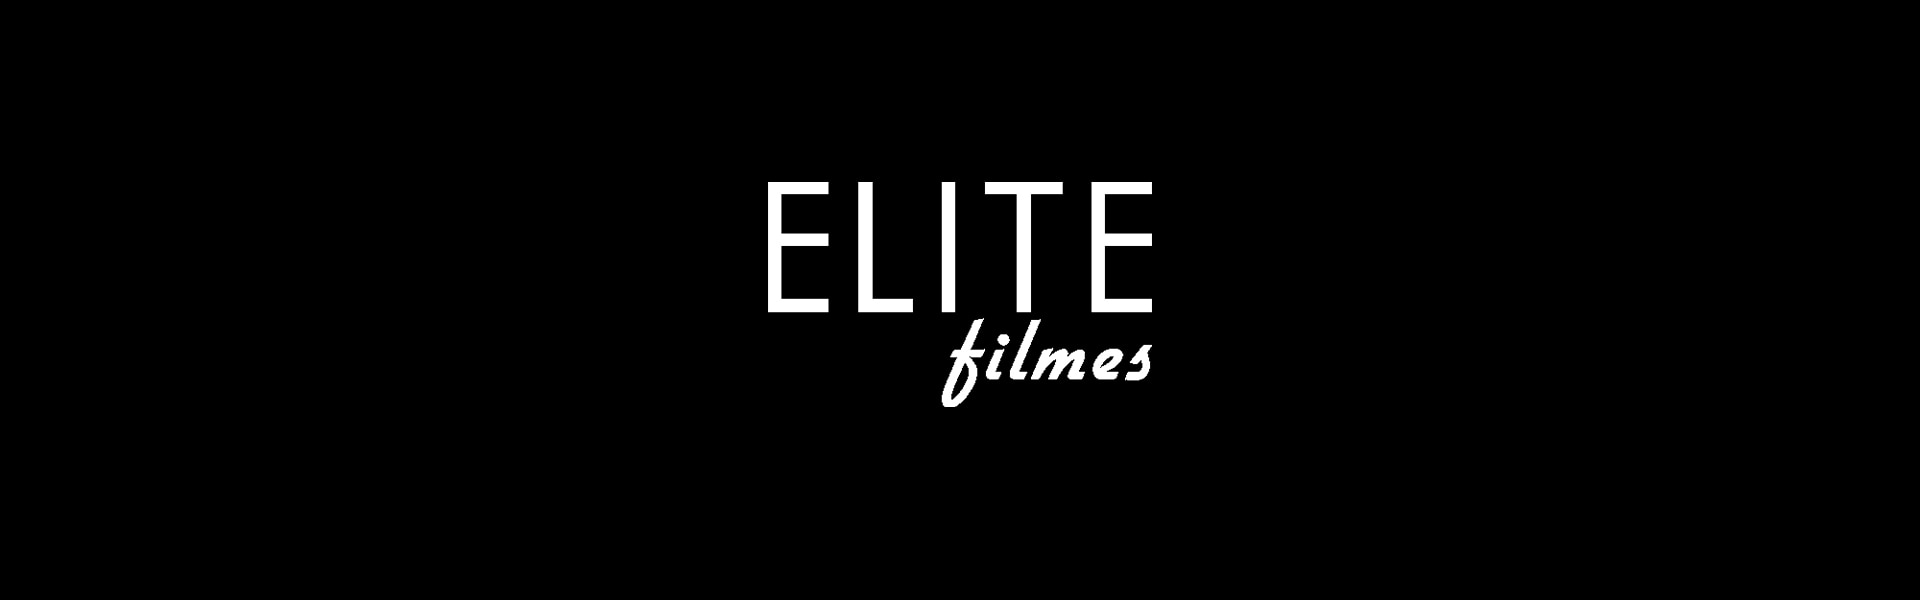 ELITE FILMES